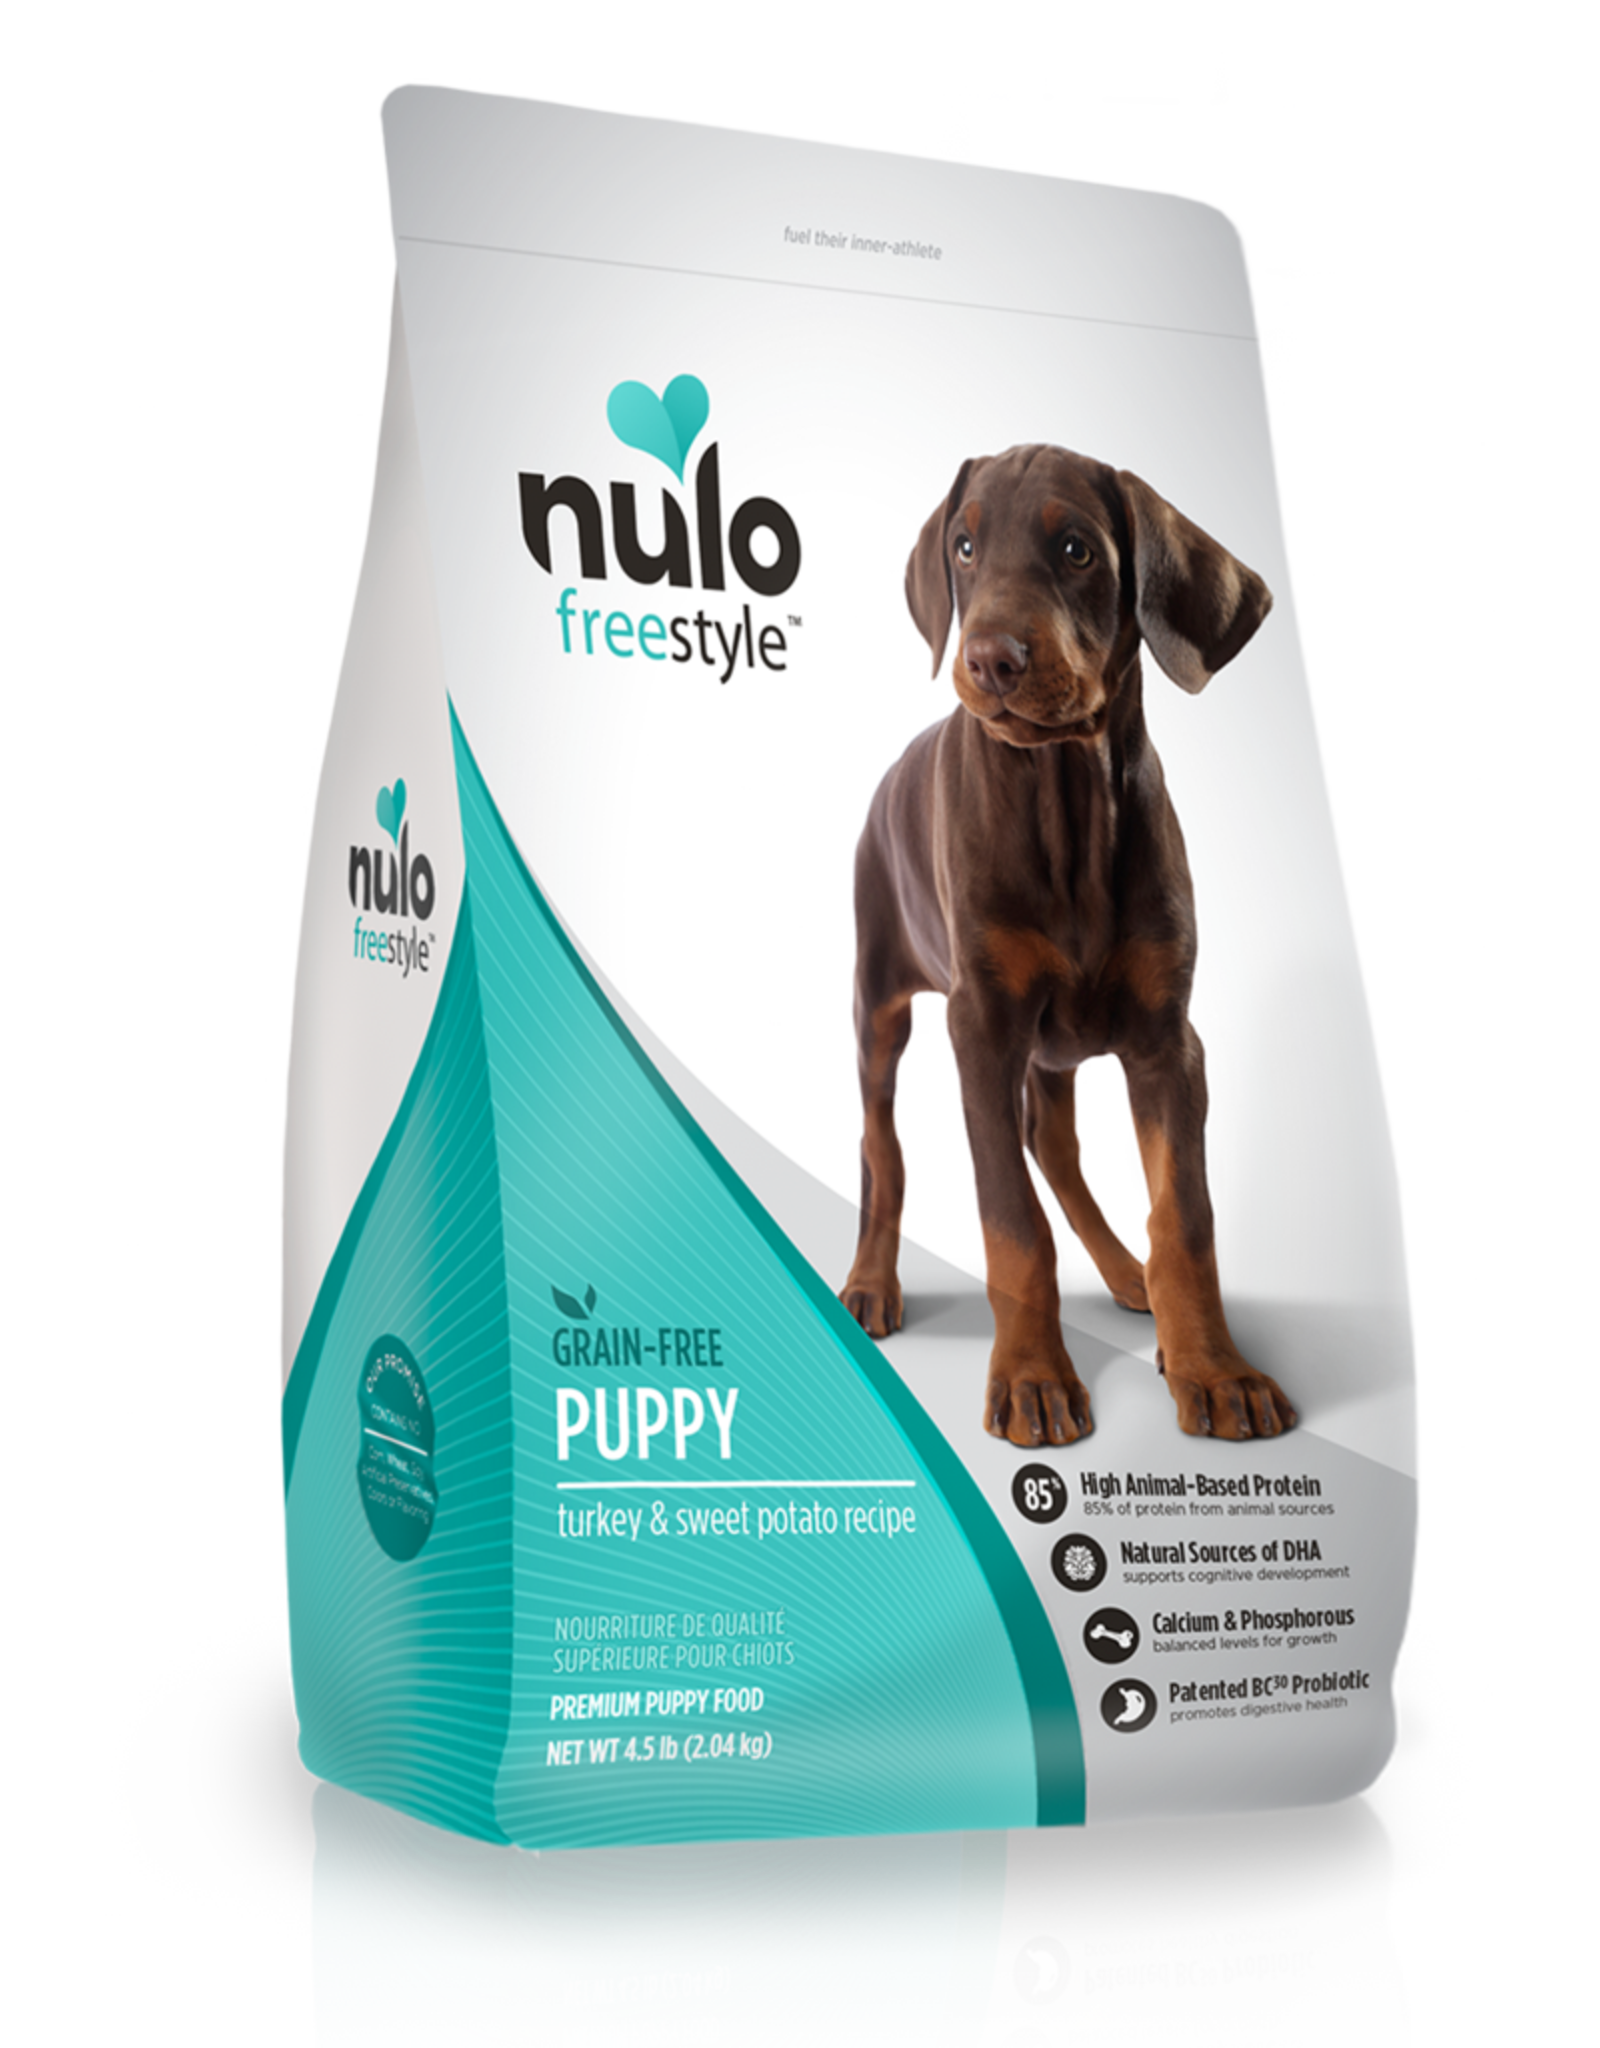 Nulo Dog Freestyle Turkey & Sweet Potato Puppy - Grain-Free 4.5lb